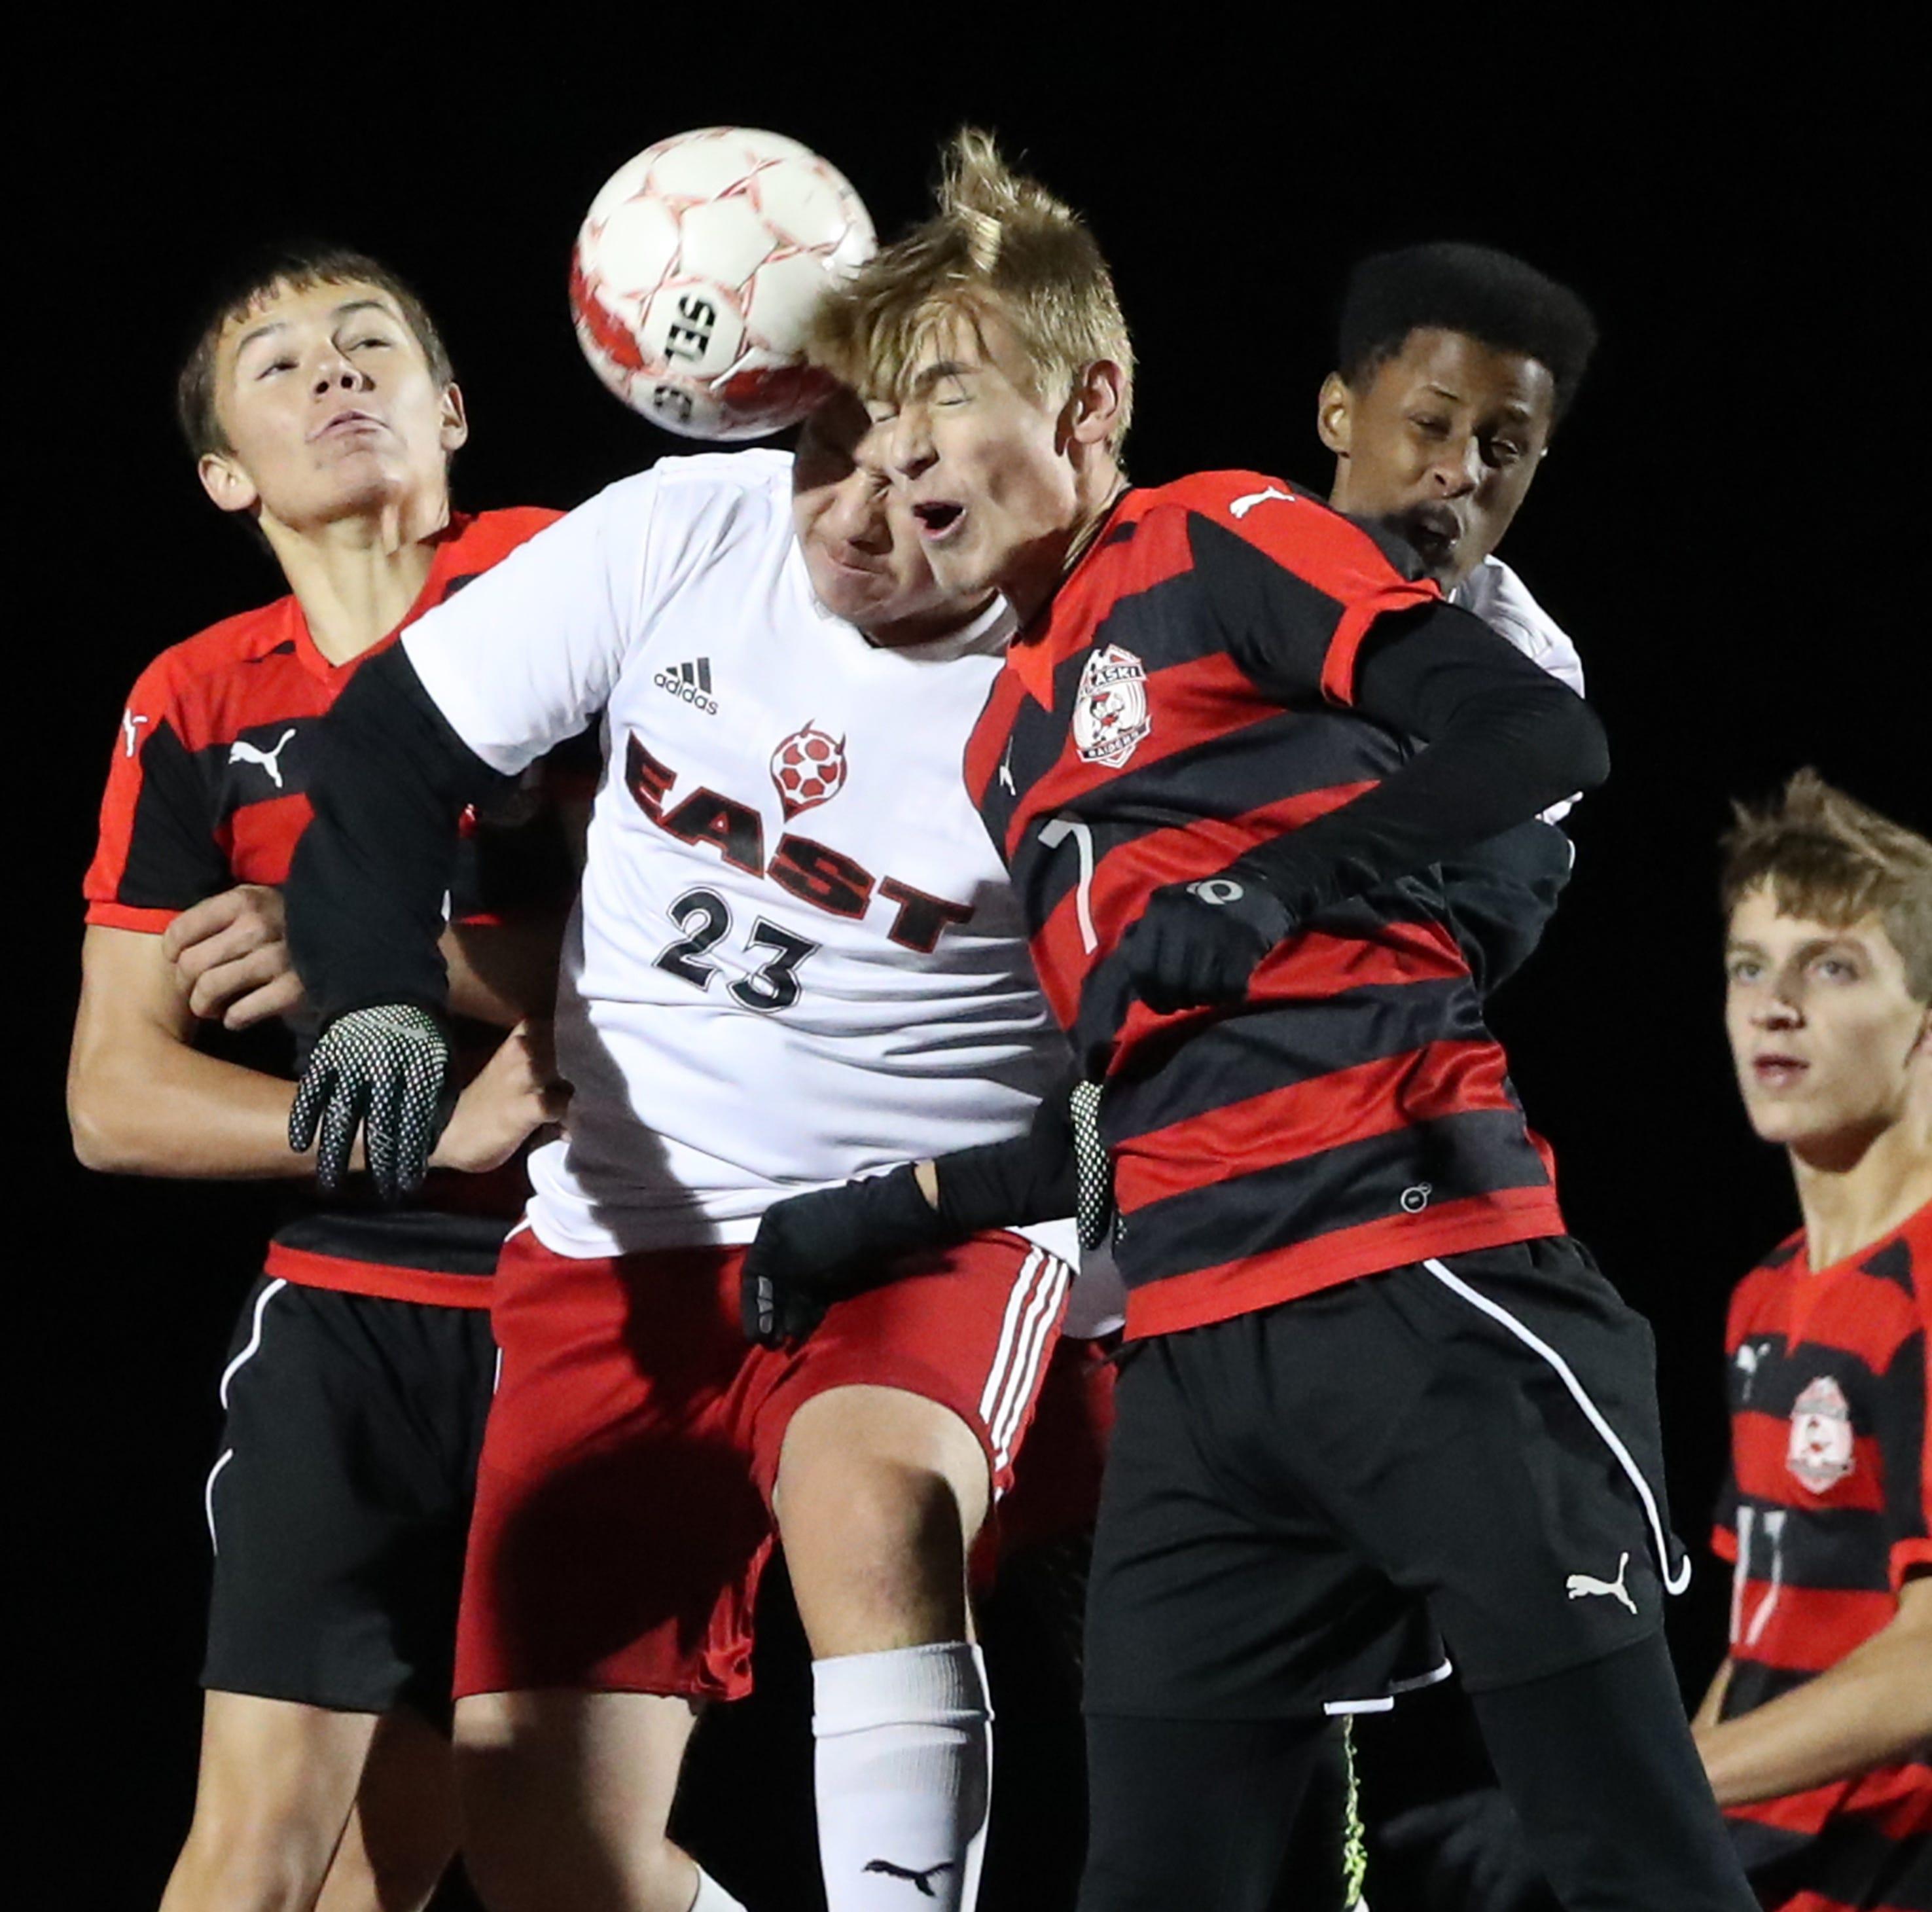 Pulaski hosts Green Bay East in WIAA regional soccer playoff